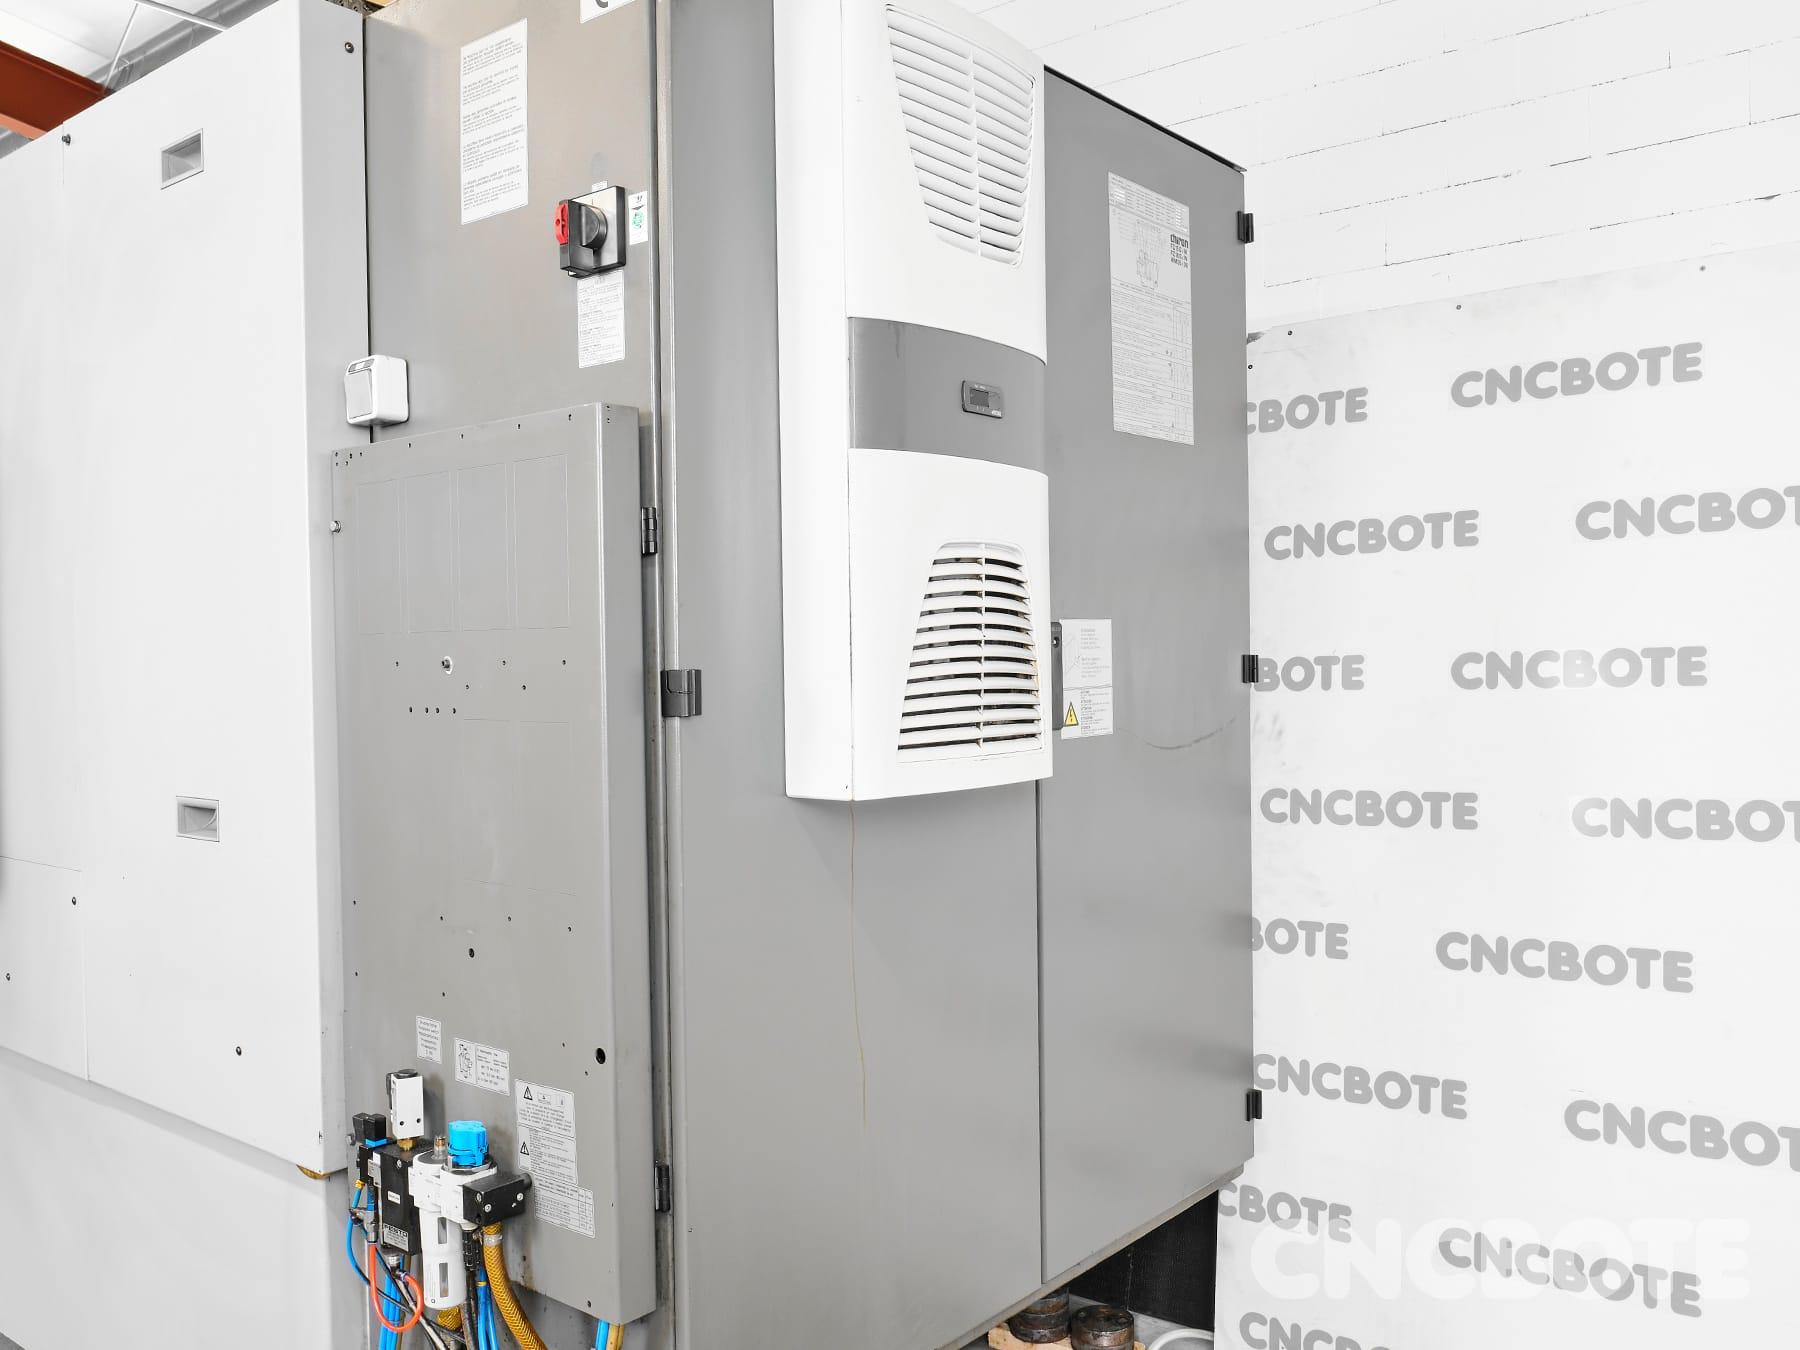 Chiron FZ 15W Bearbeitungszentrum